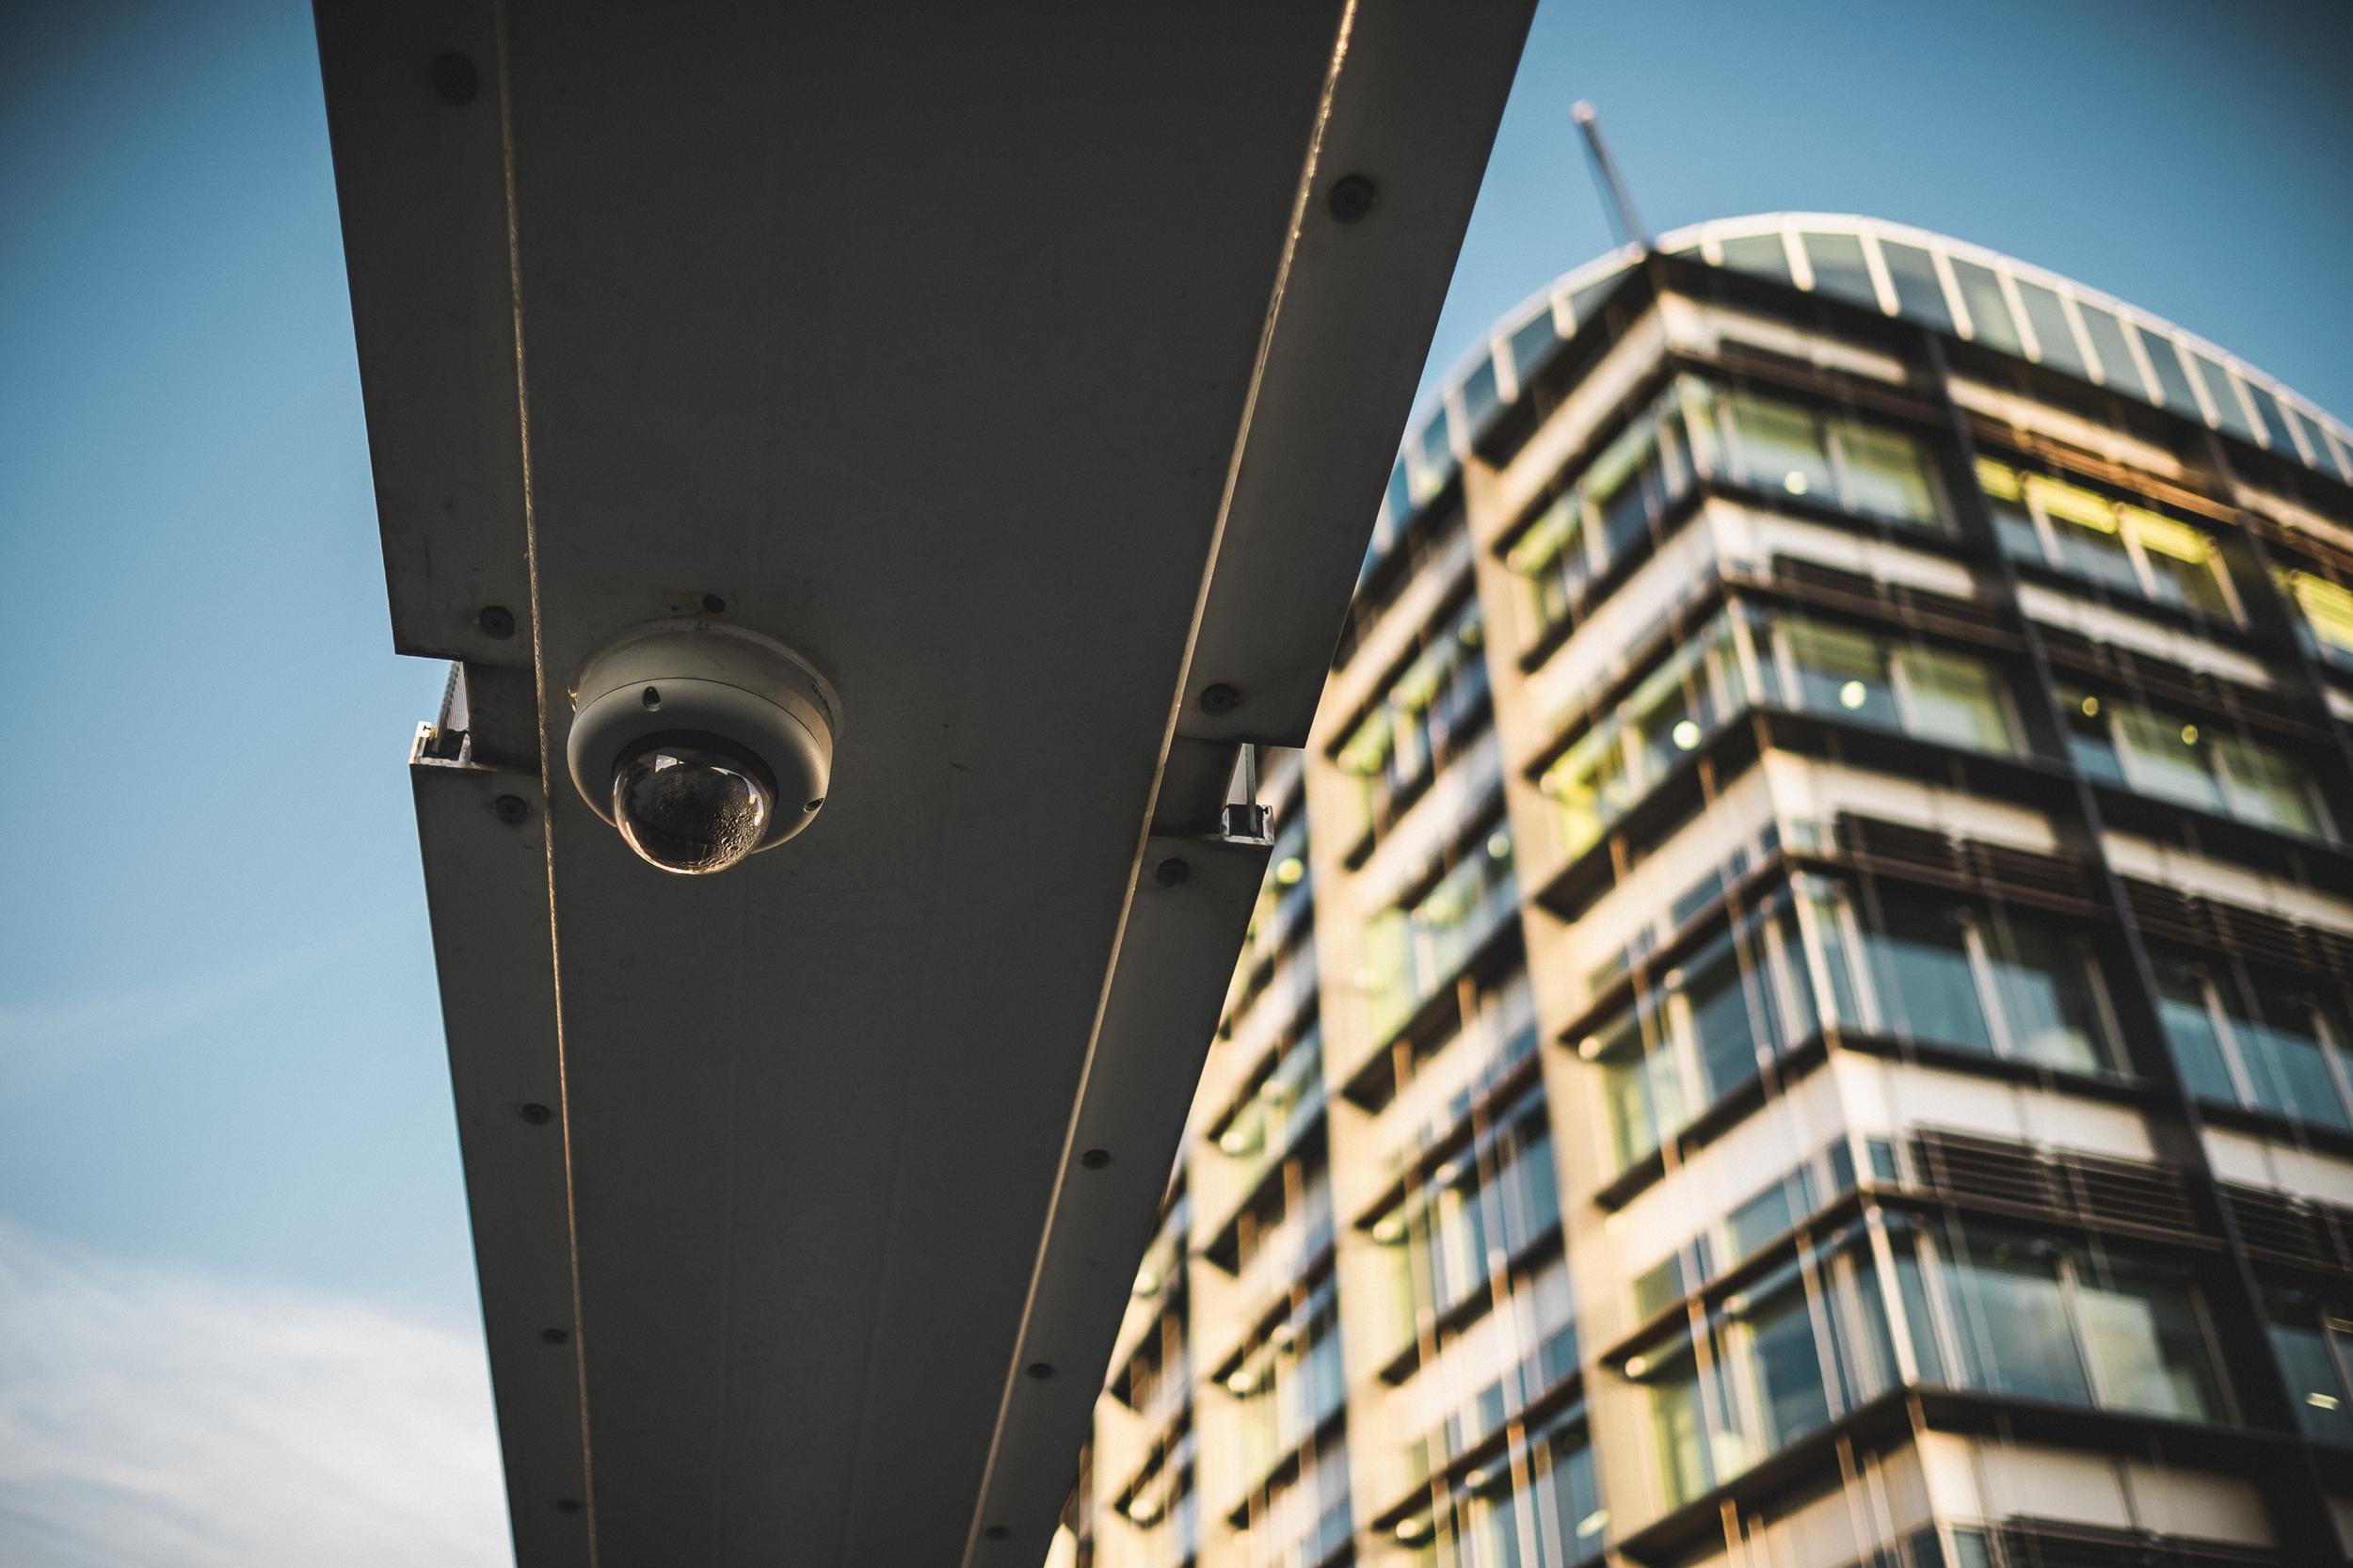 London Fuji Photowalk | Fuji XE2 | 23mm - F 1.4 - 1/750th - iso200